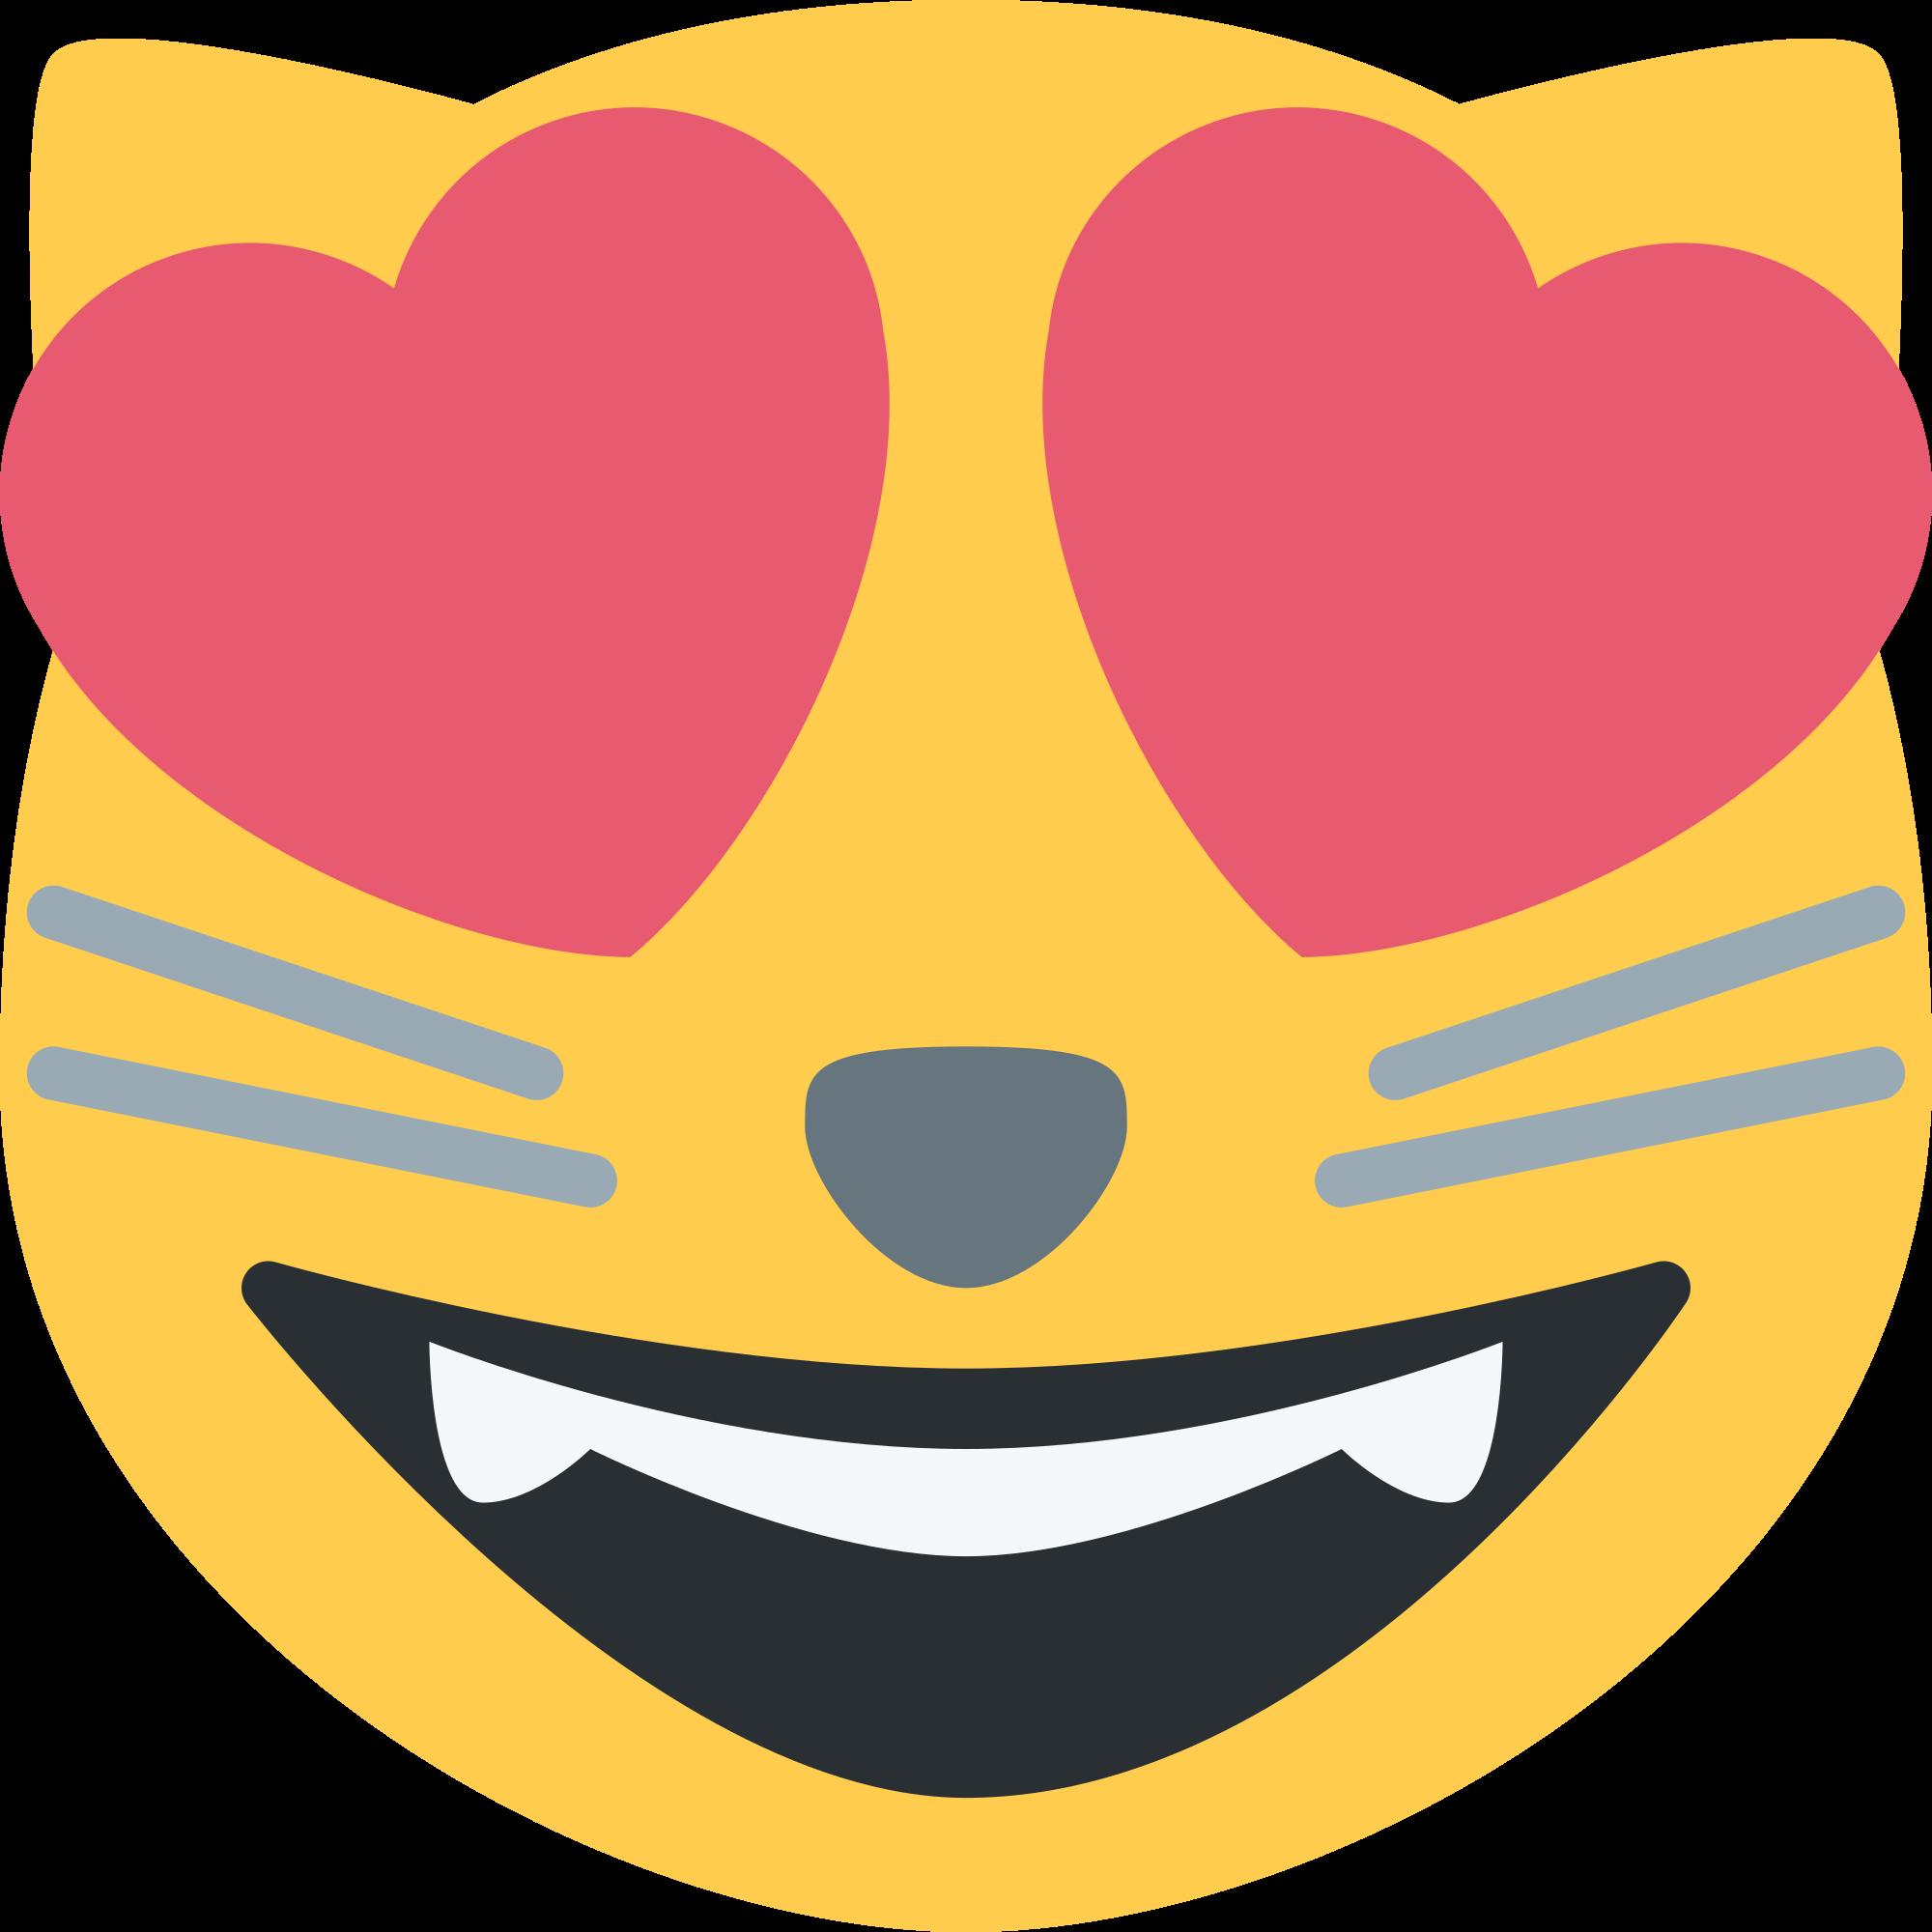 Heart clipart cat. Emoji eyes png